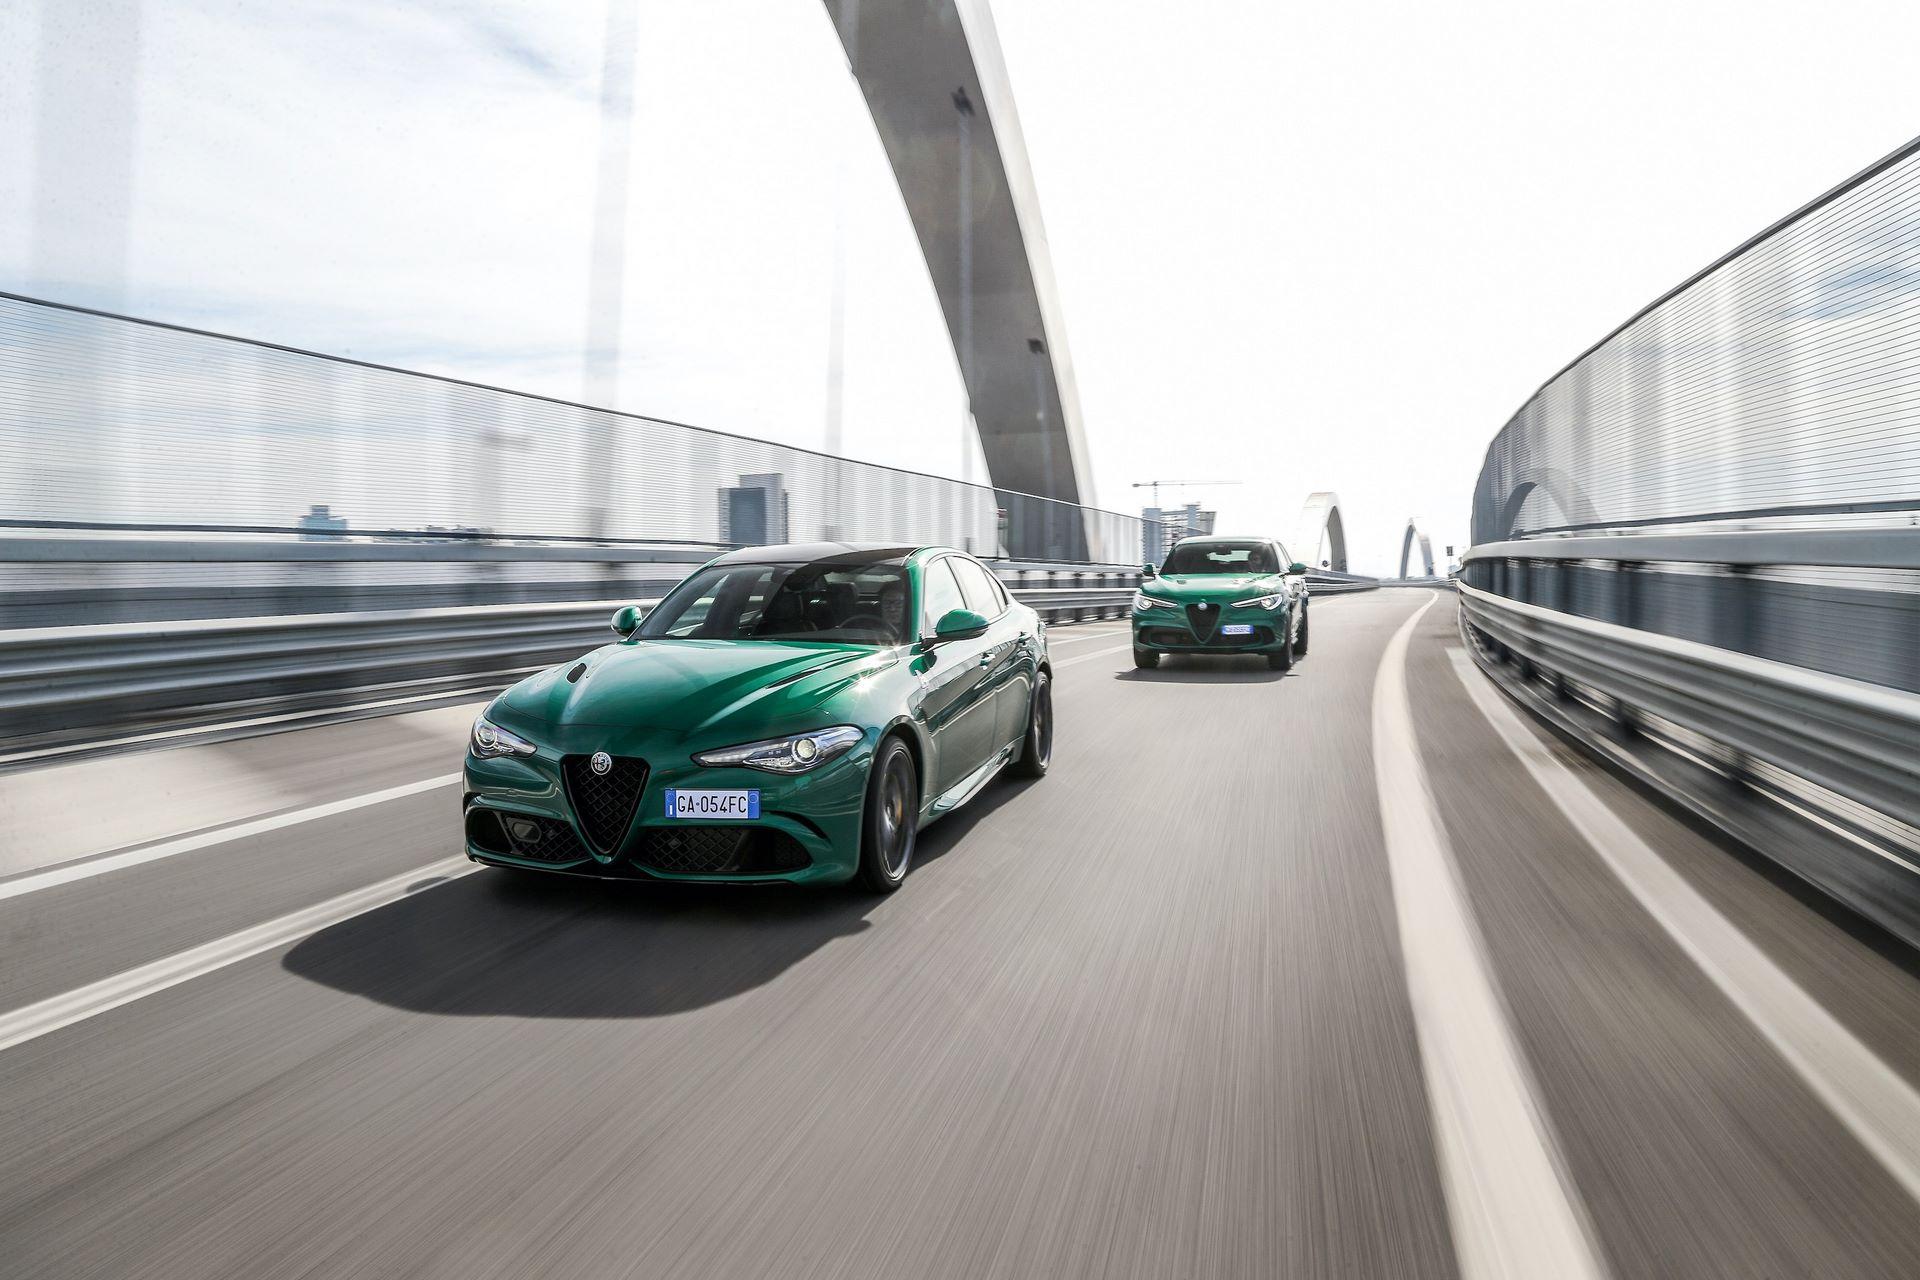 Alfa-Romeo-Giulia-Quadrifoglio-Stelvio-Quadrifoglio-facelift-2020-7